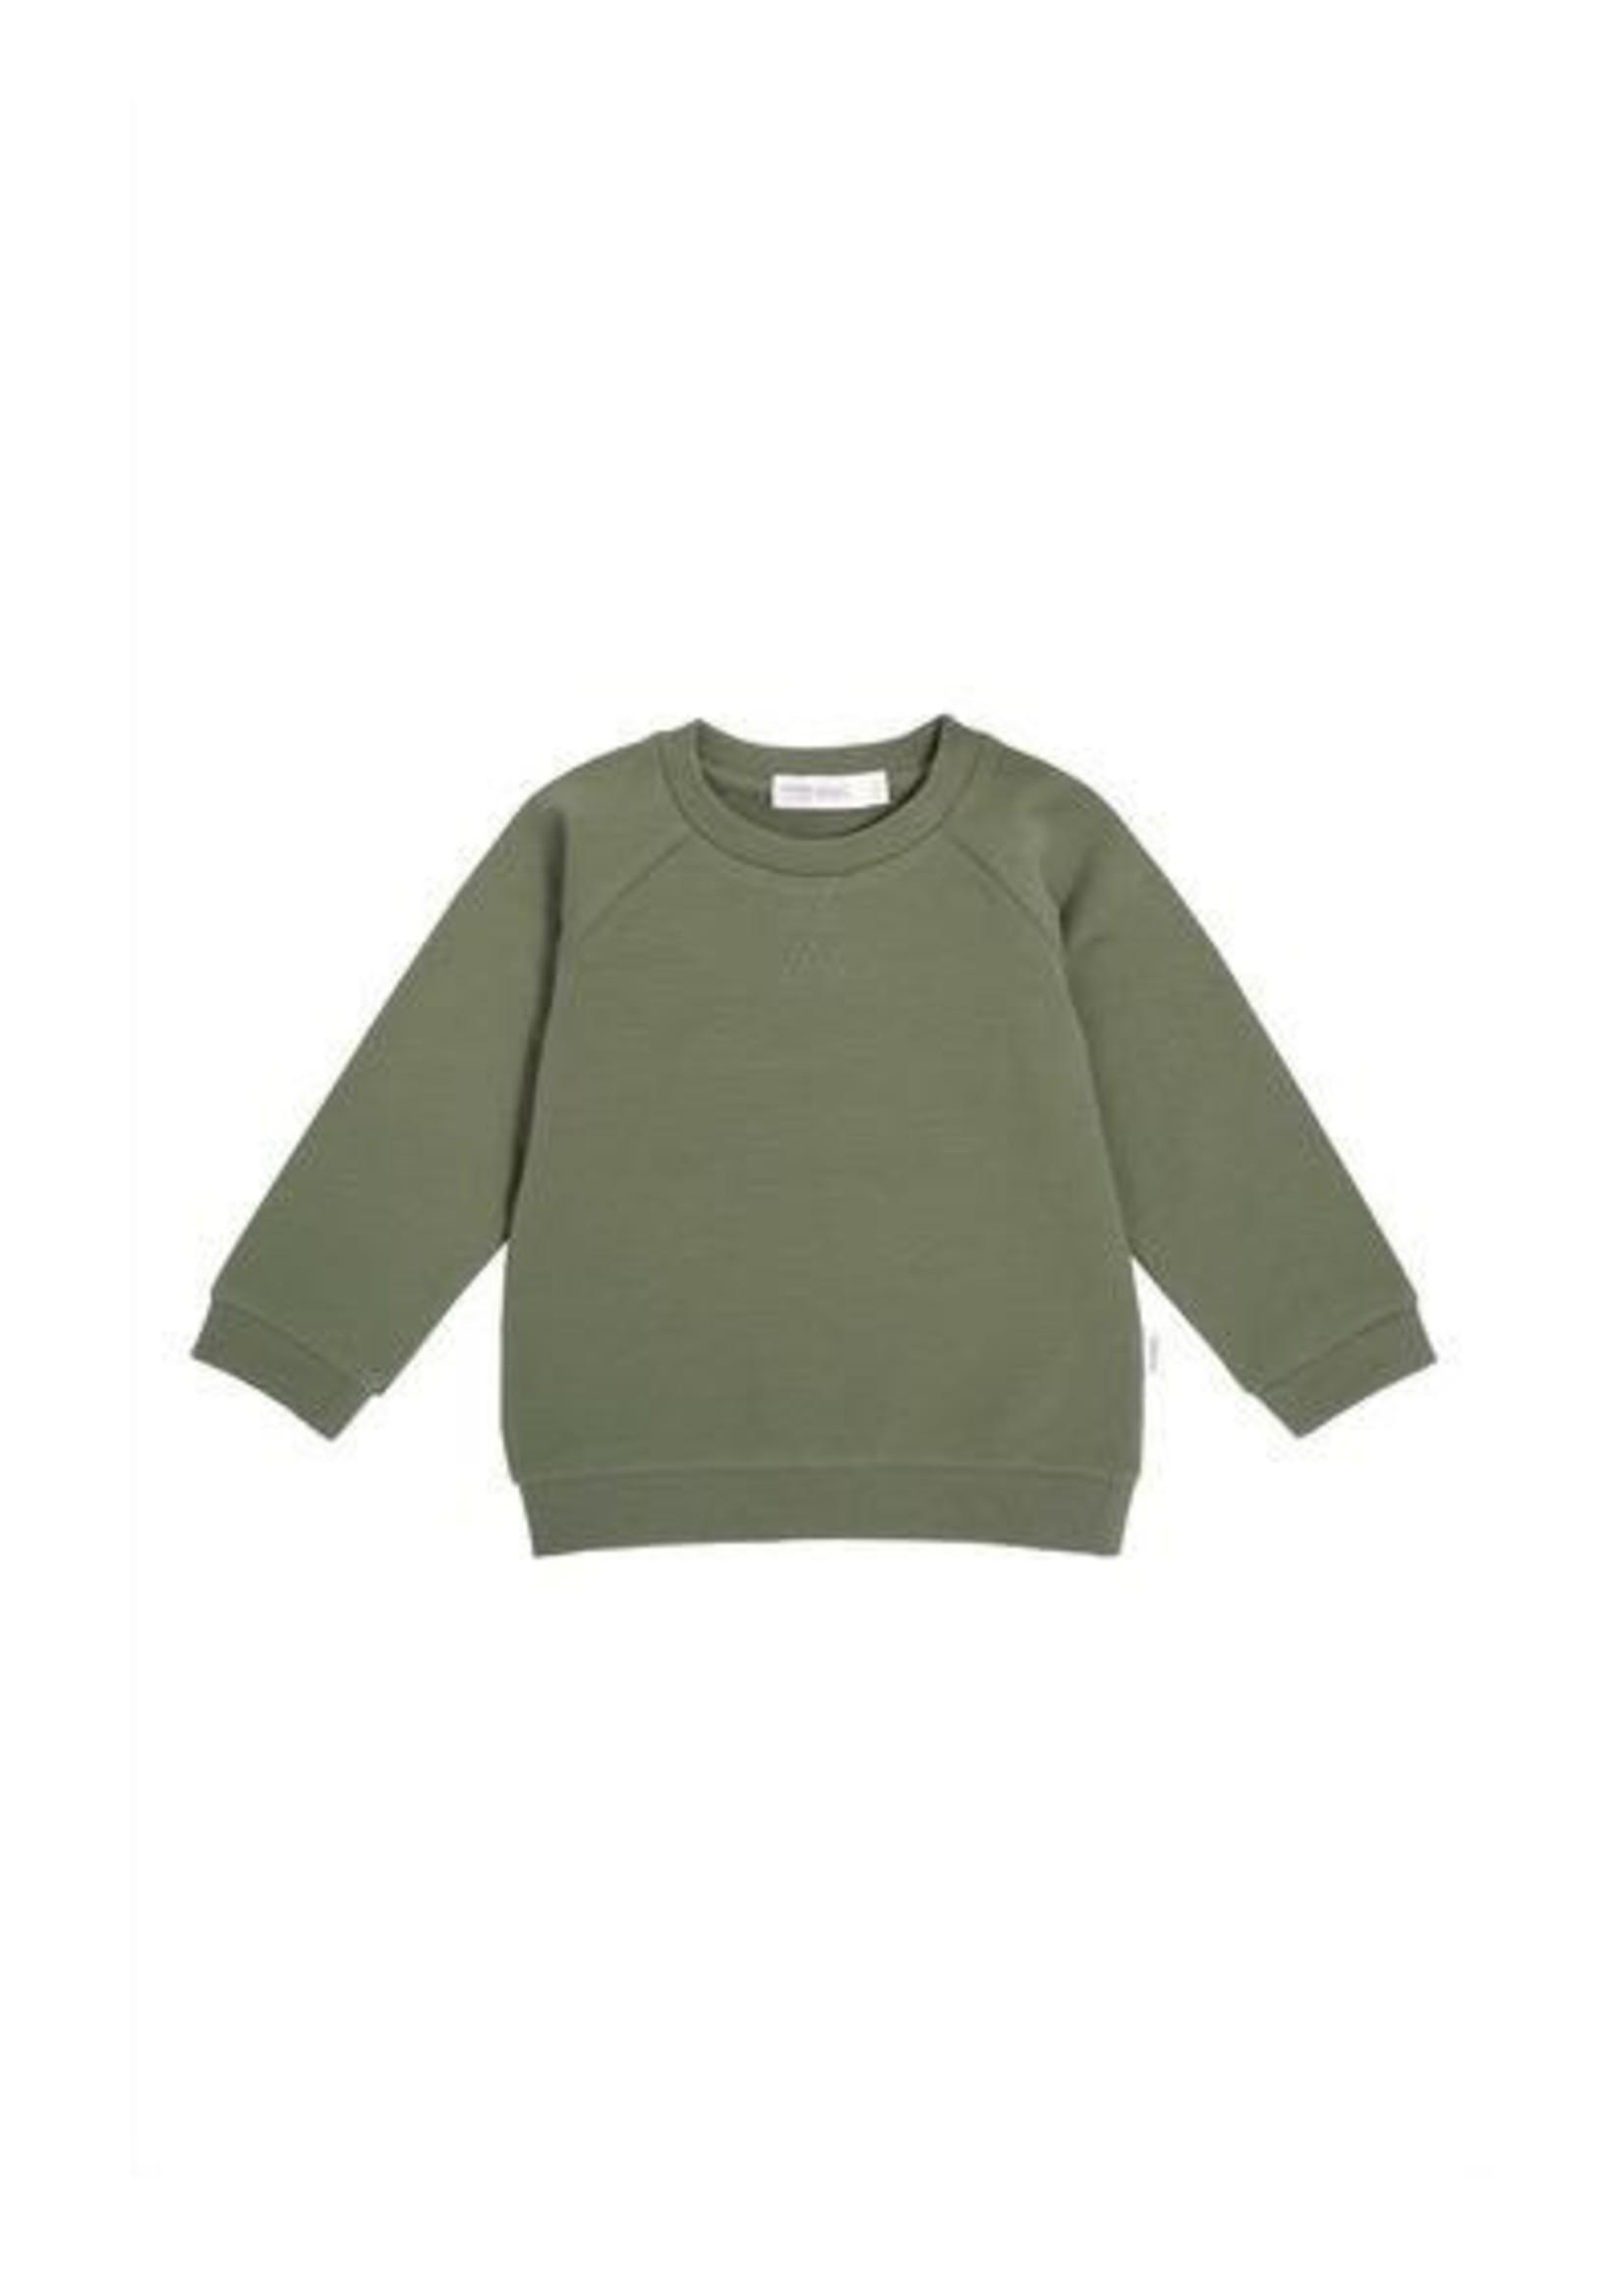 Miles Baby Miles Baby,  Khaki Baby Knit Sweatshirt